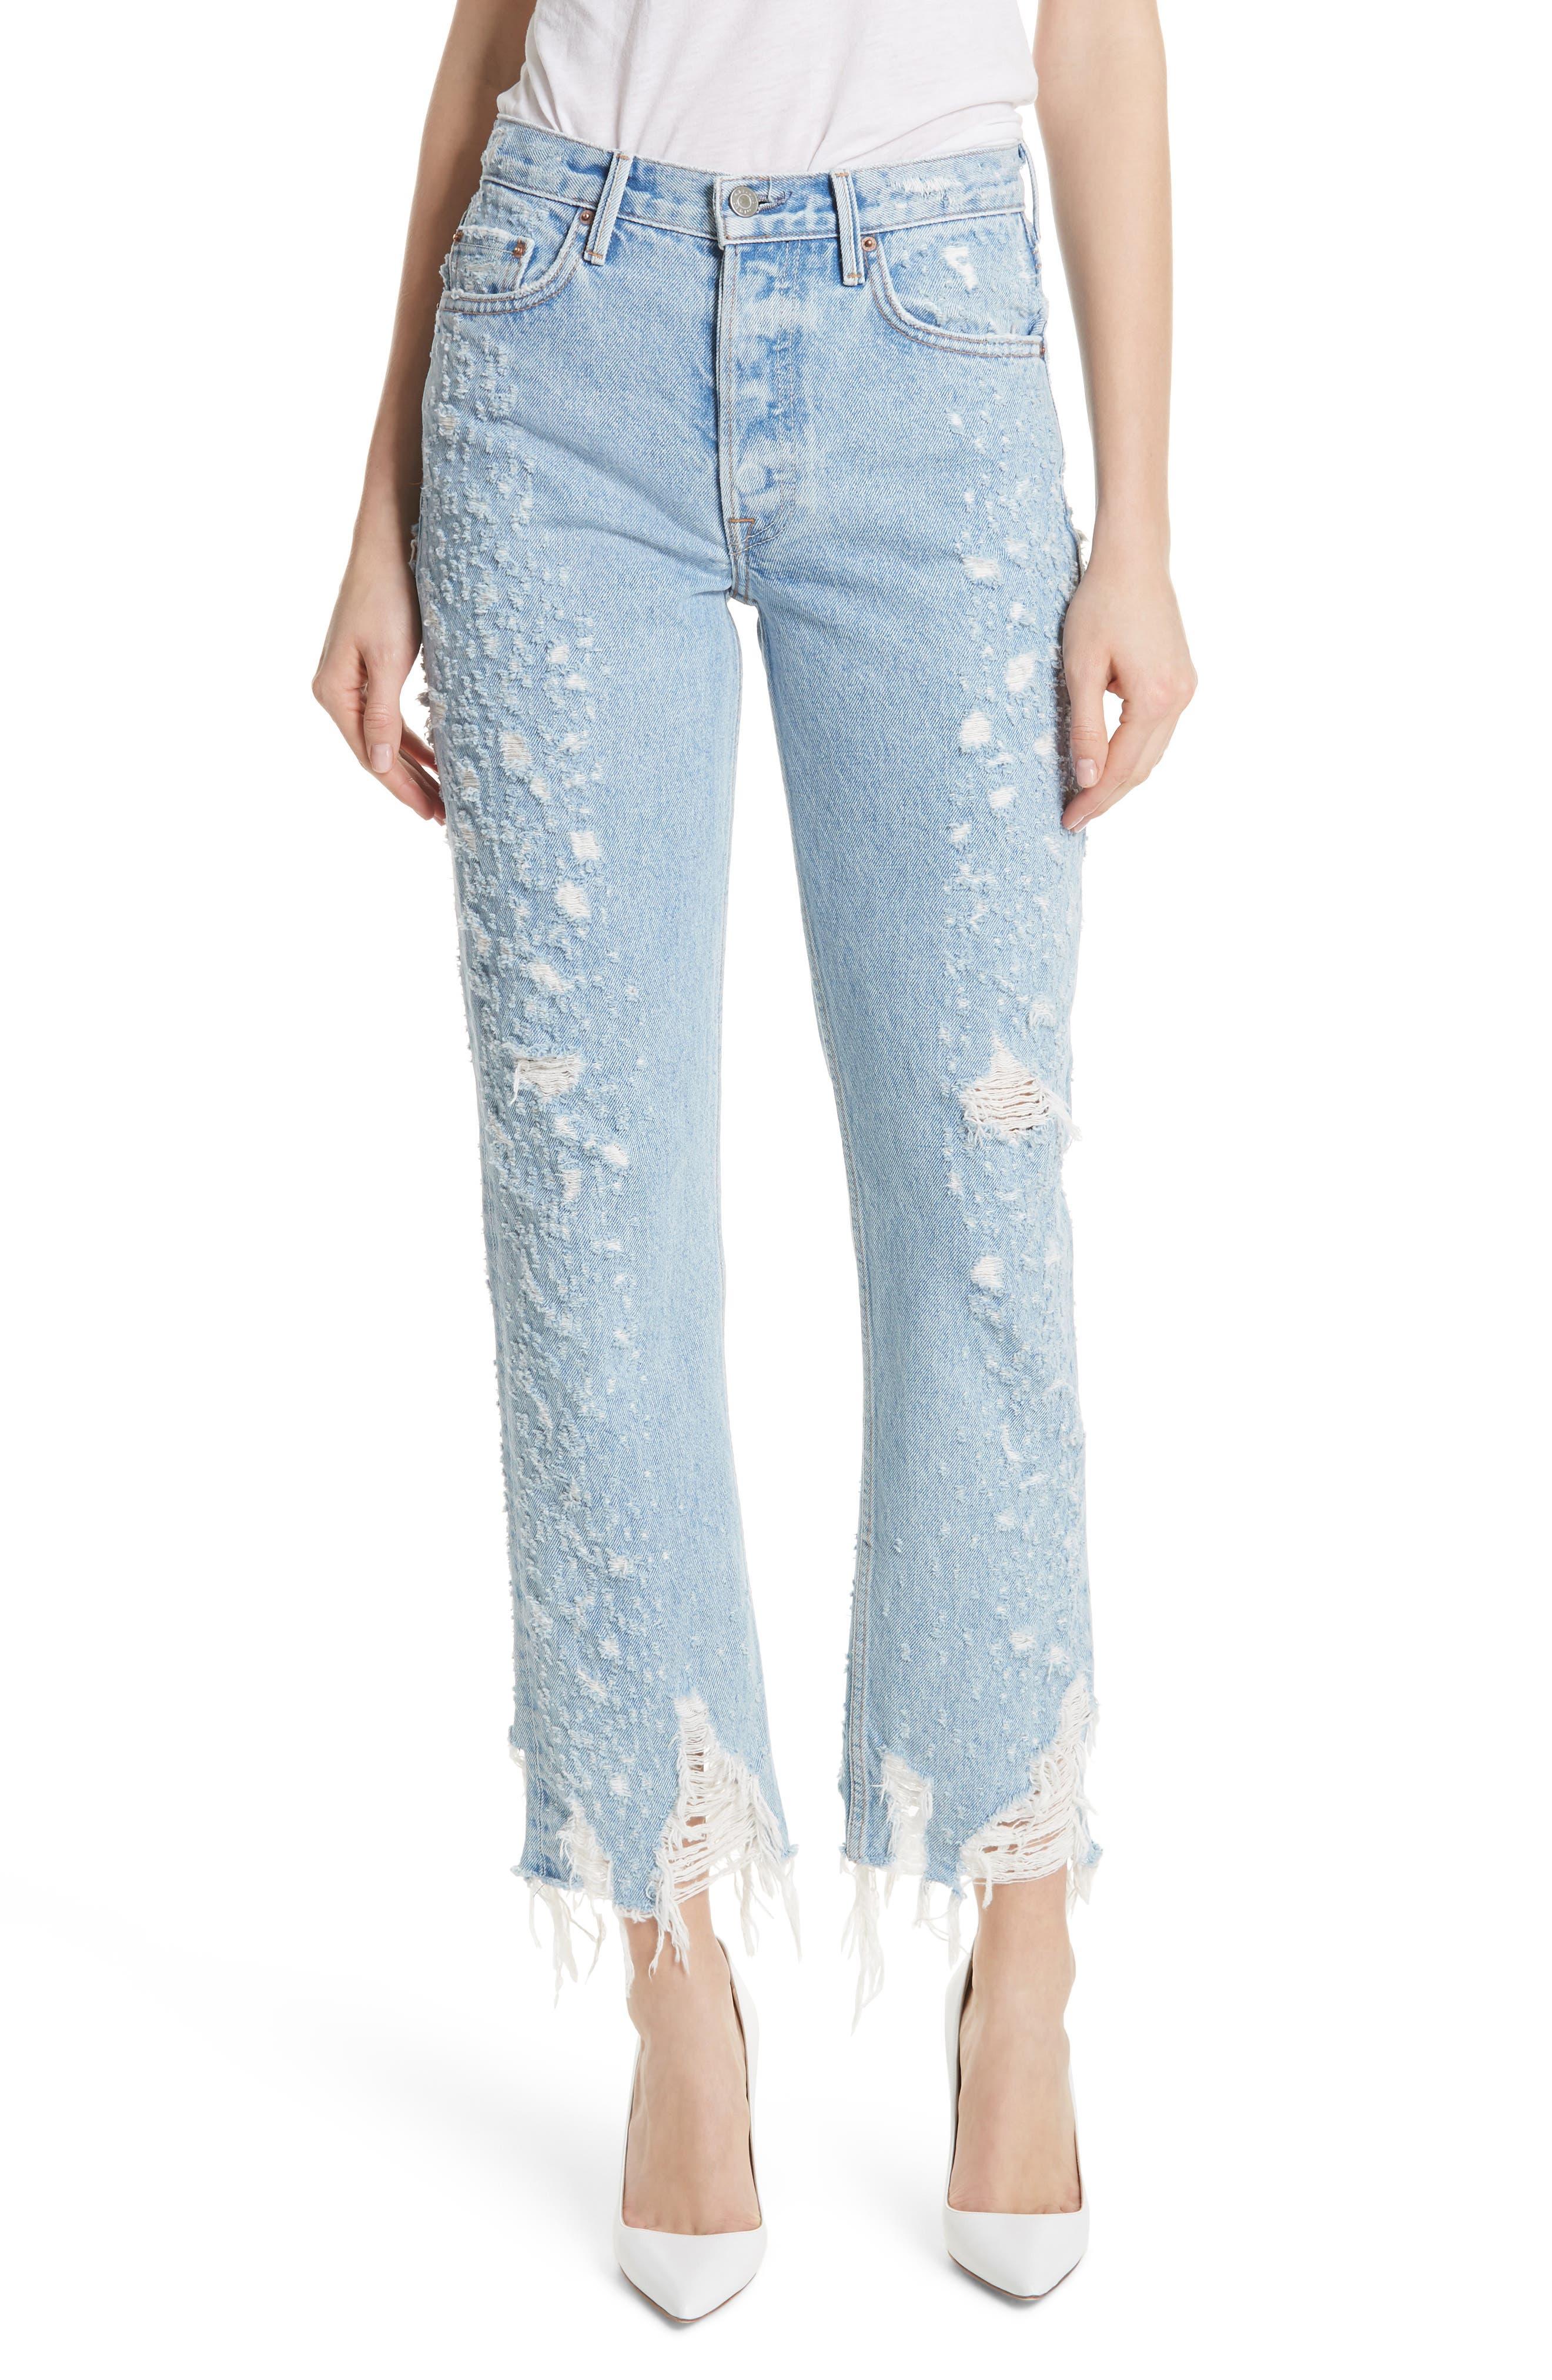 Helena Rigid High Waist Straight Jeans,                             Main thumbnail 1, color,                             BURN OUT